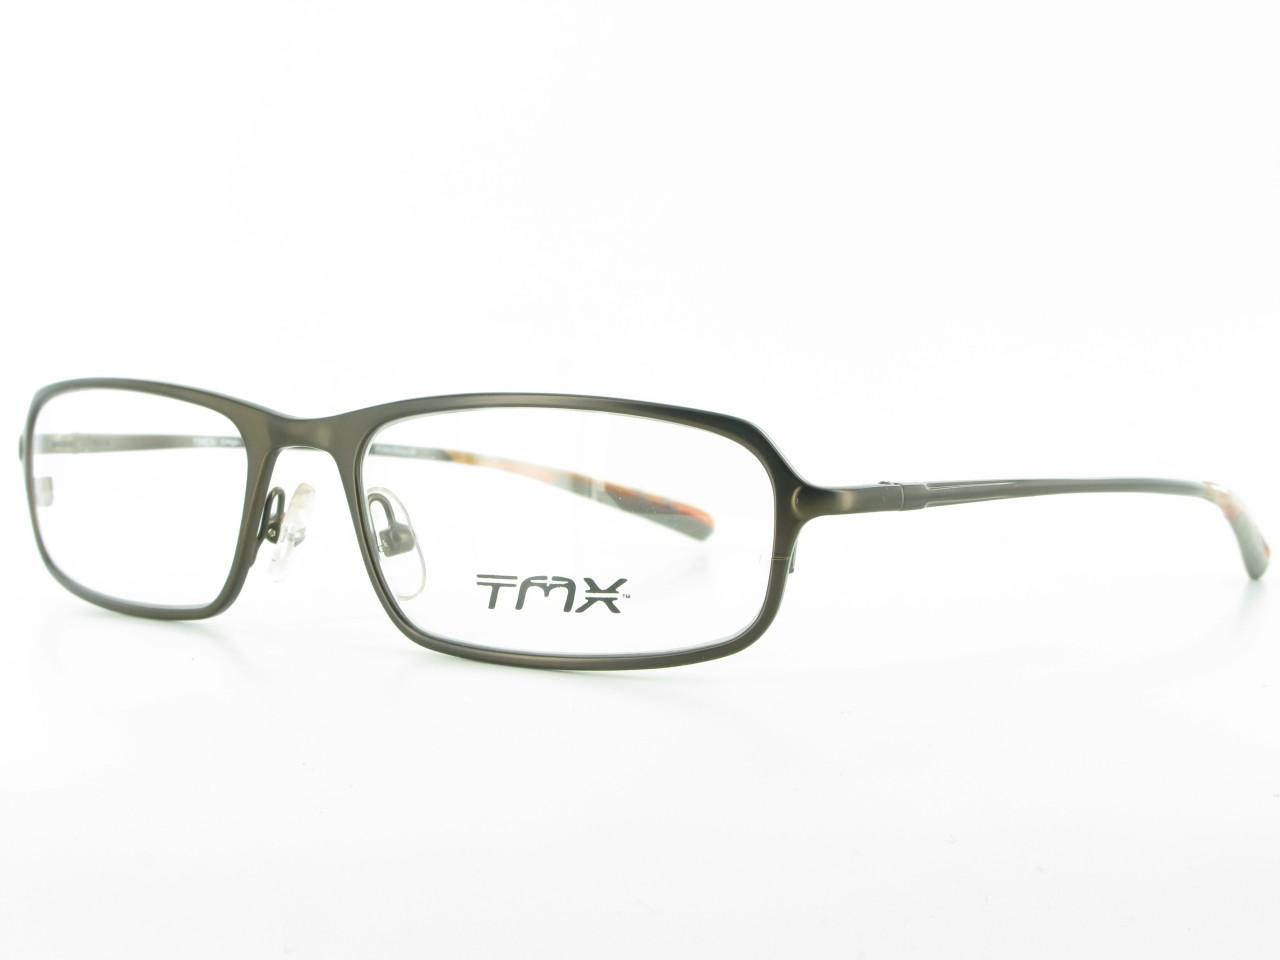 Eyeglass Frame Spring Hinge : TIMEX TMX Axle EYEGLASS FRAME Metal Spring Hinge Brown eBay